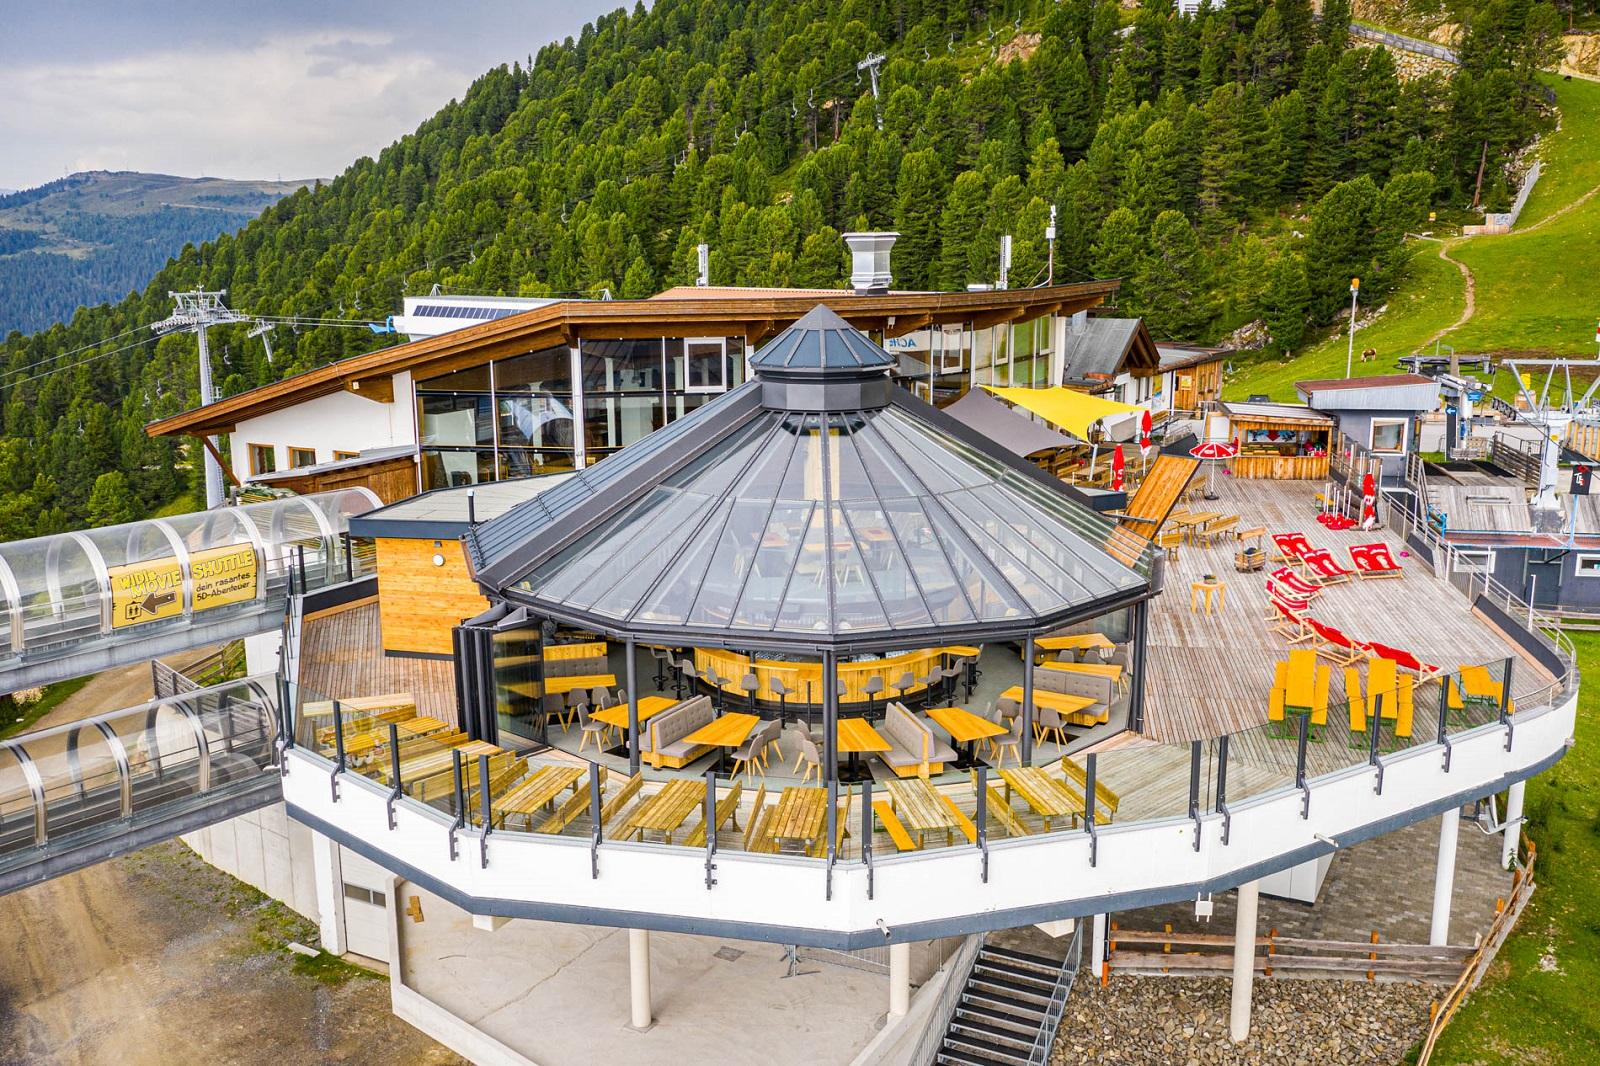 Open Air Apres Ski - Kristallbar Ötz